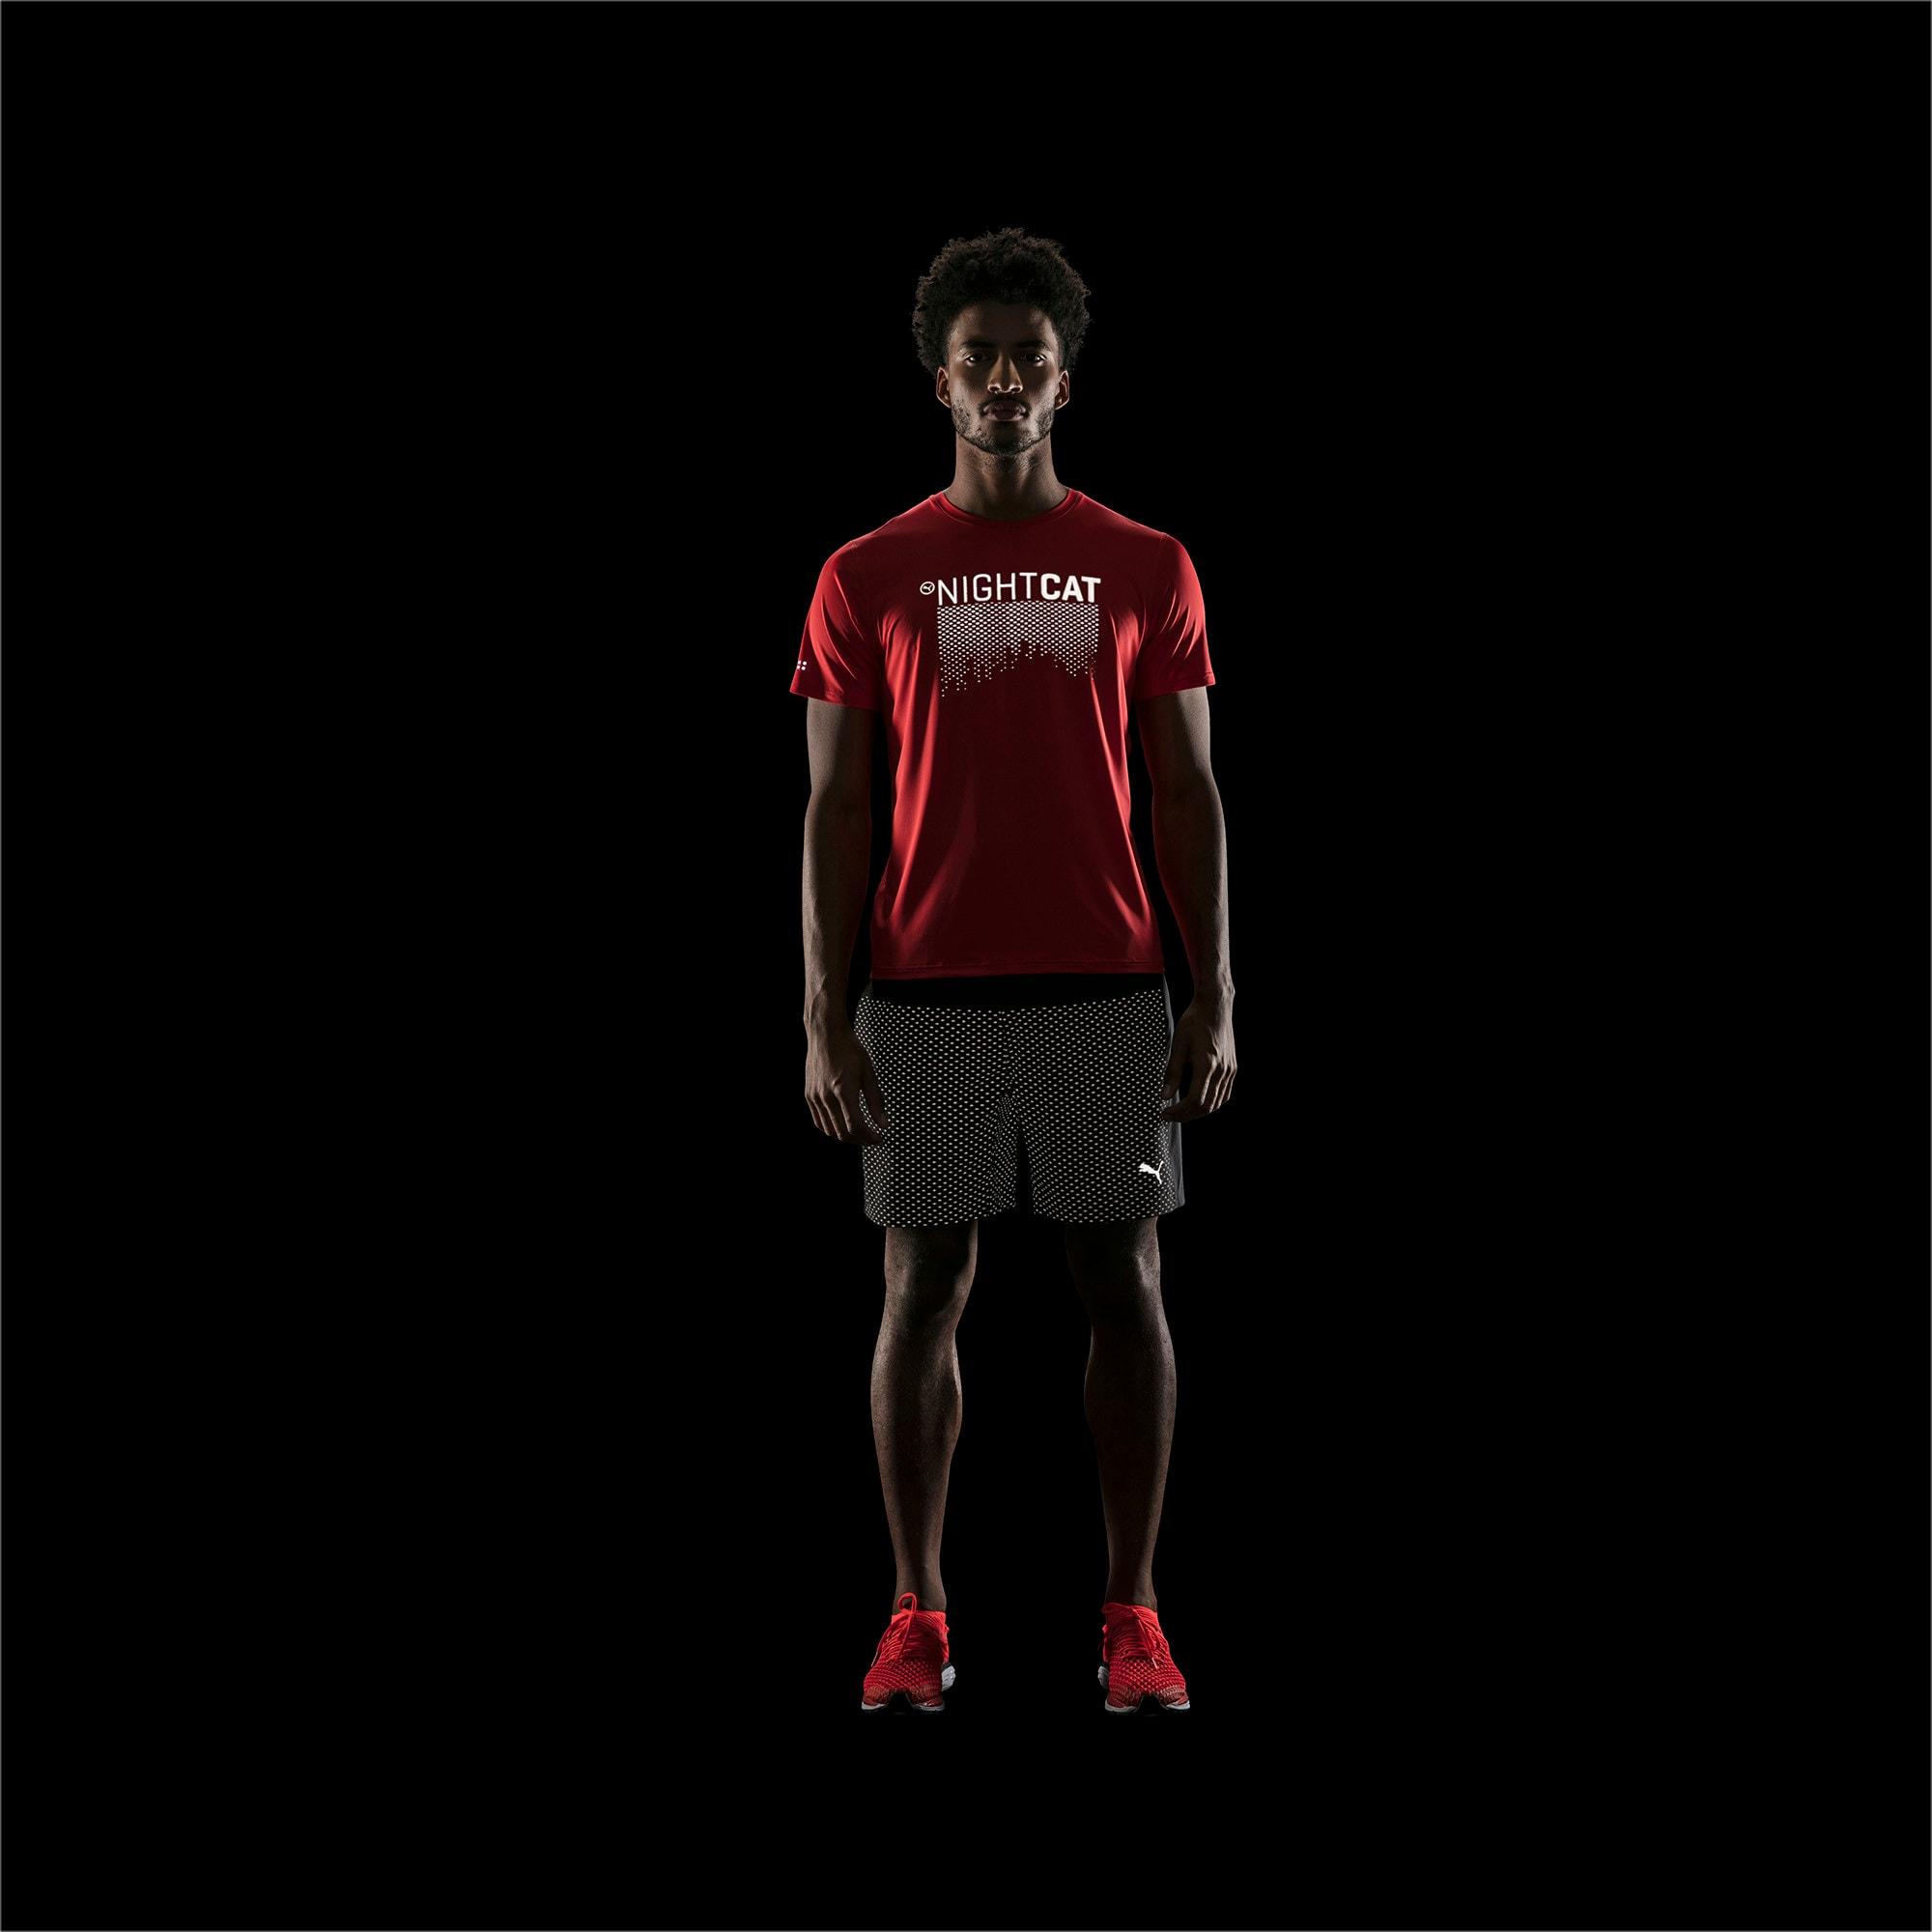 Thumbnail 3 of NightCat Men's Short Sleeve T-Shirt, Flame Scarlet, medium-IND